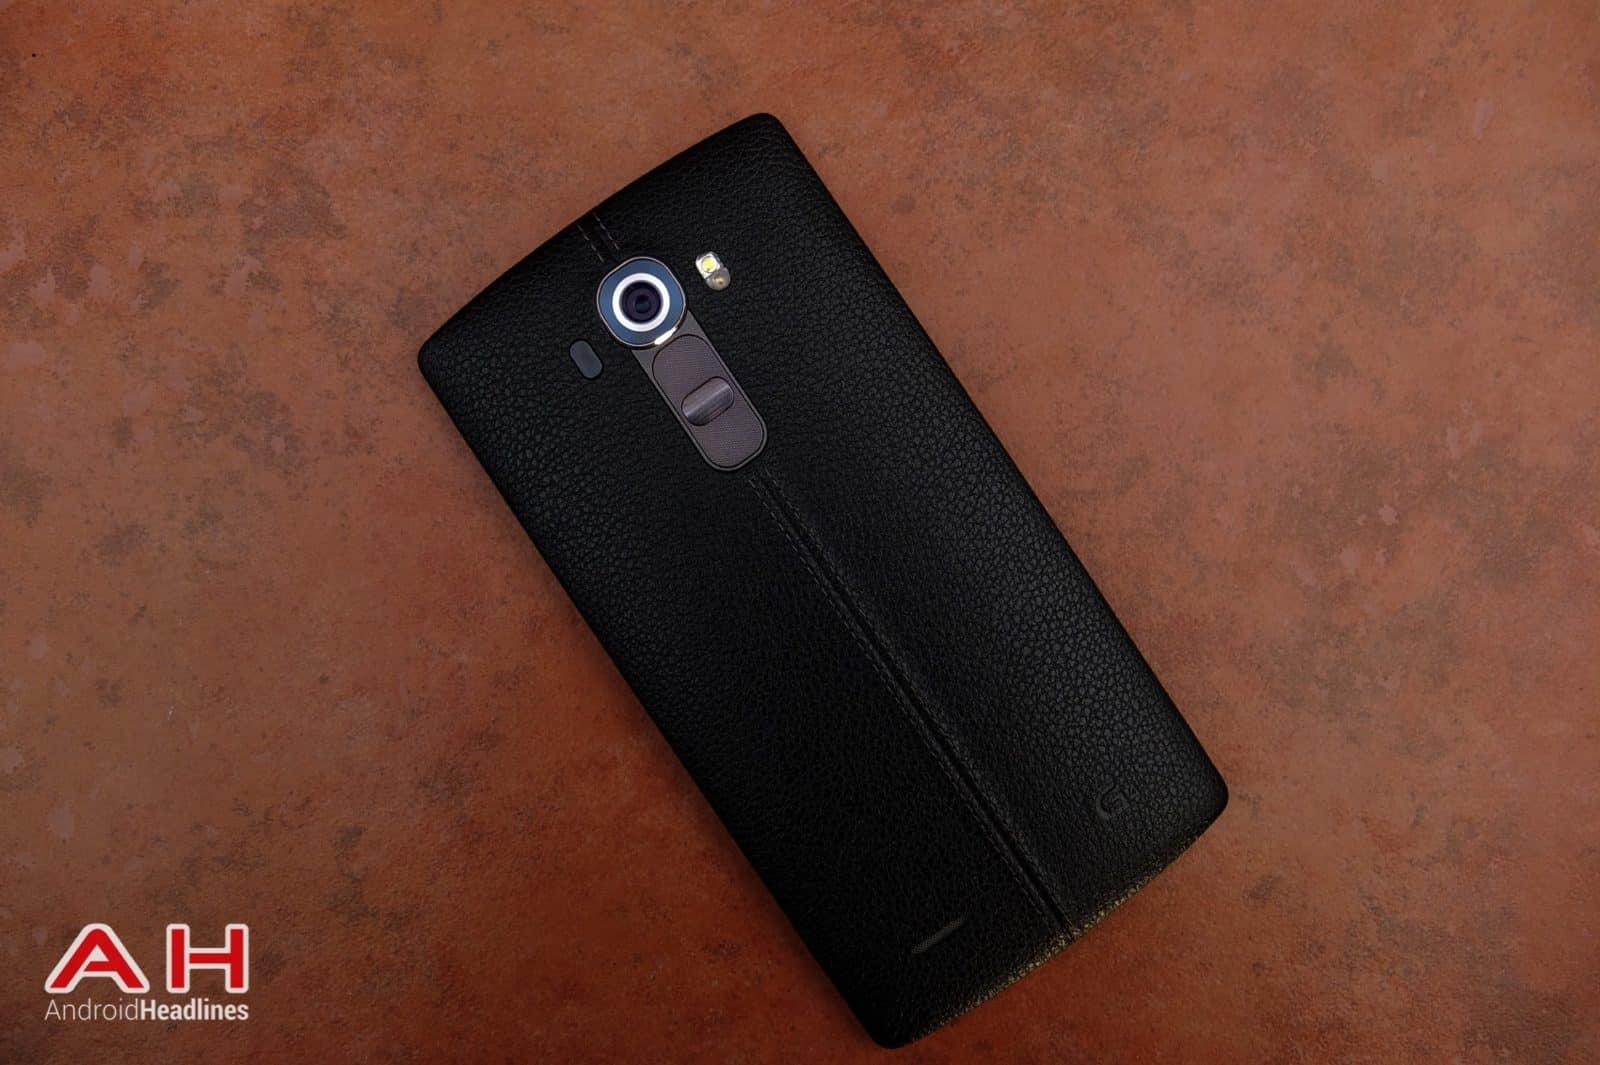 LG G4 BlackLeather TD AH 09